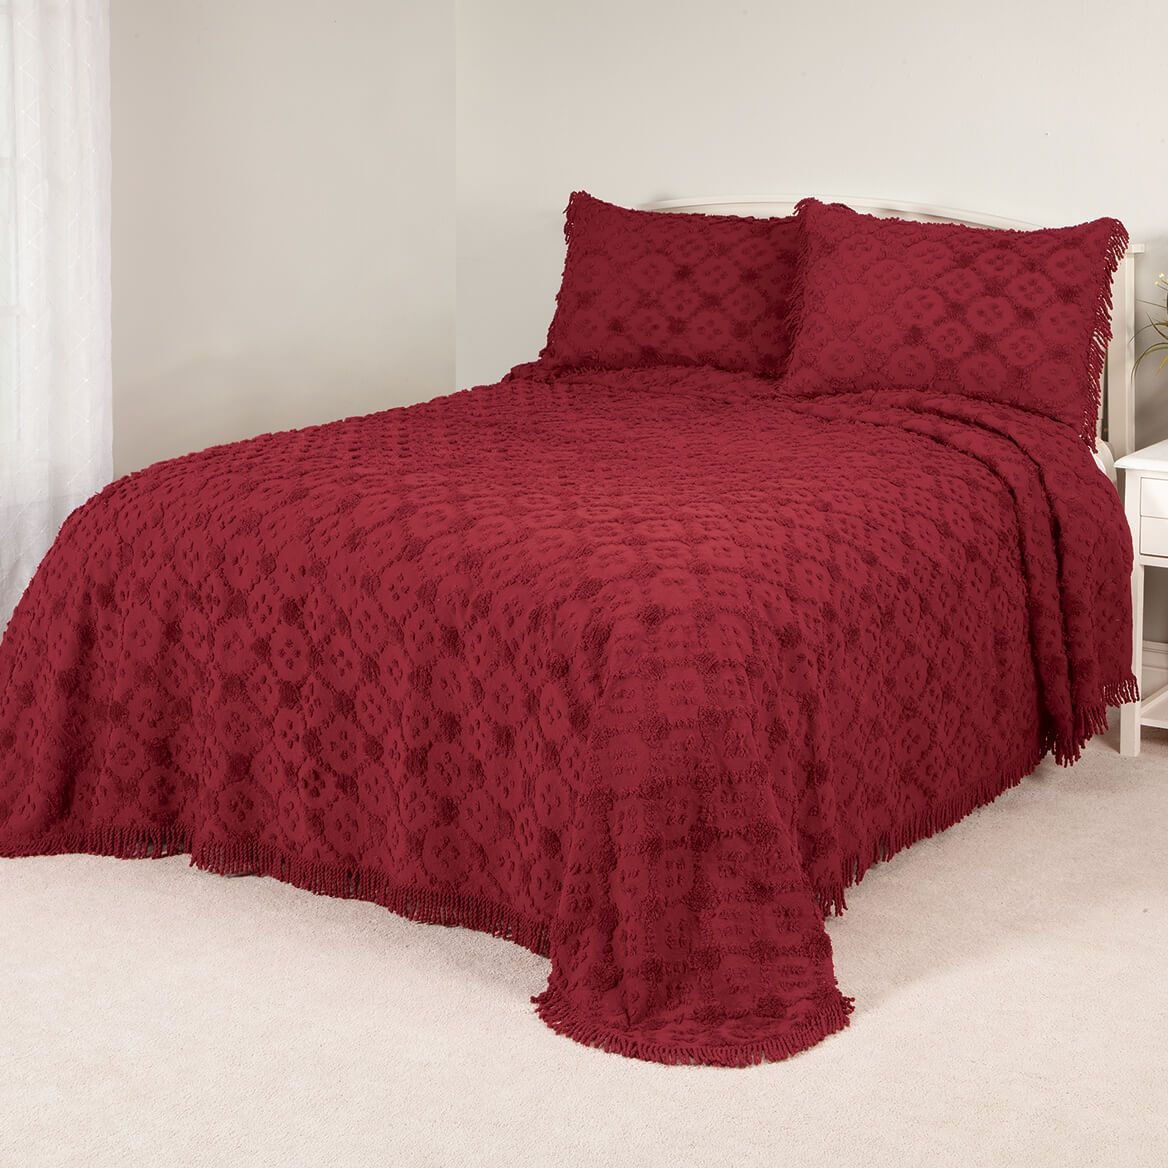 Charleston Way Chenille Bedding Set-370533